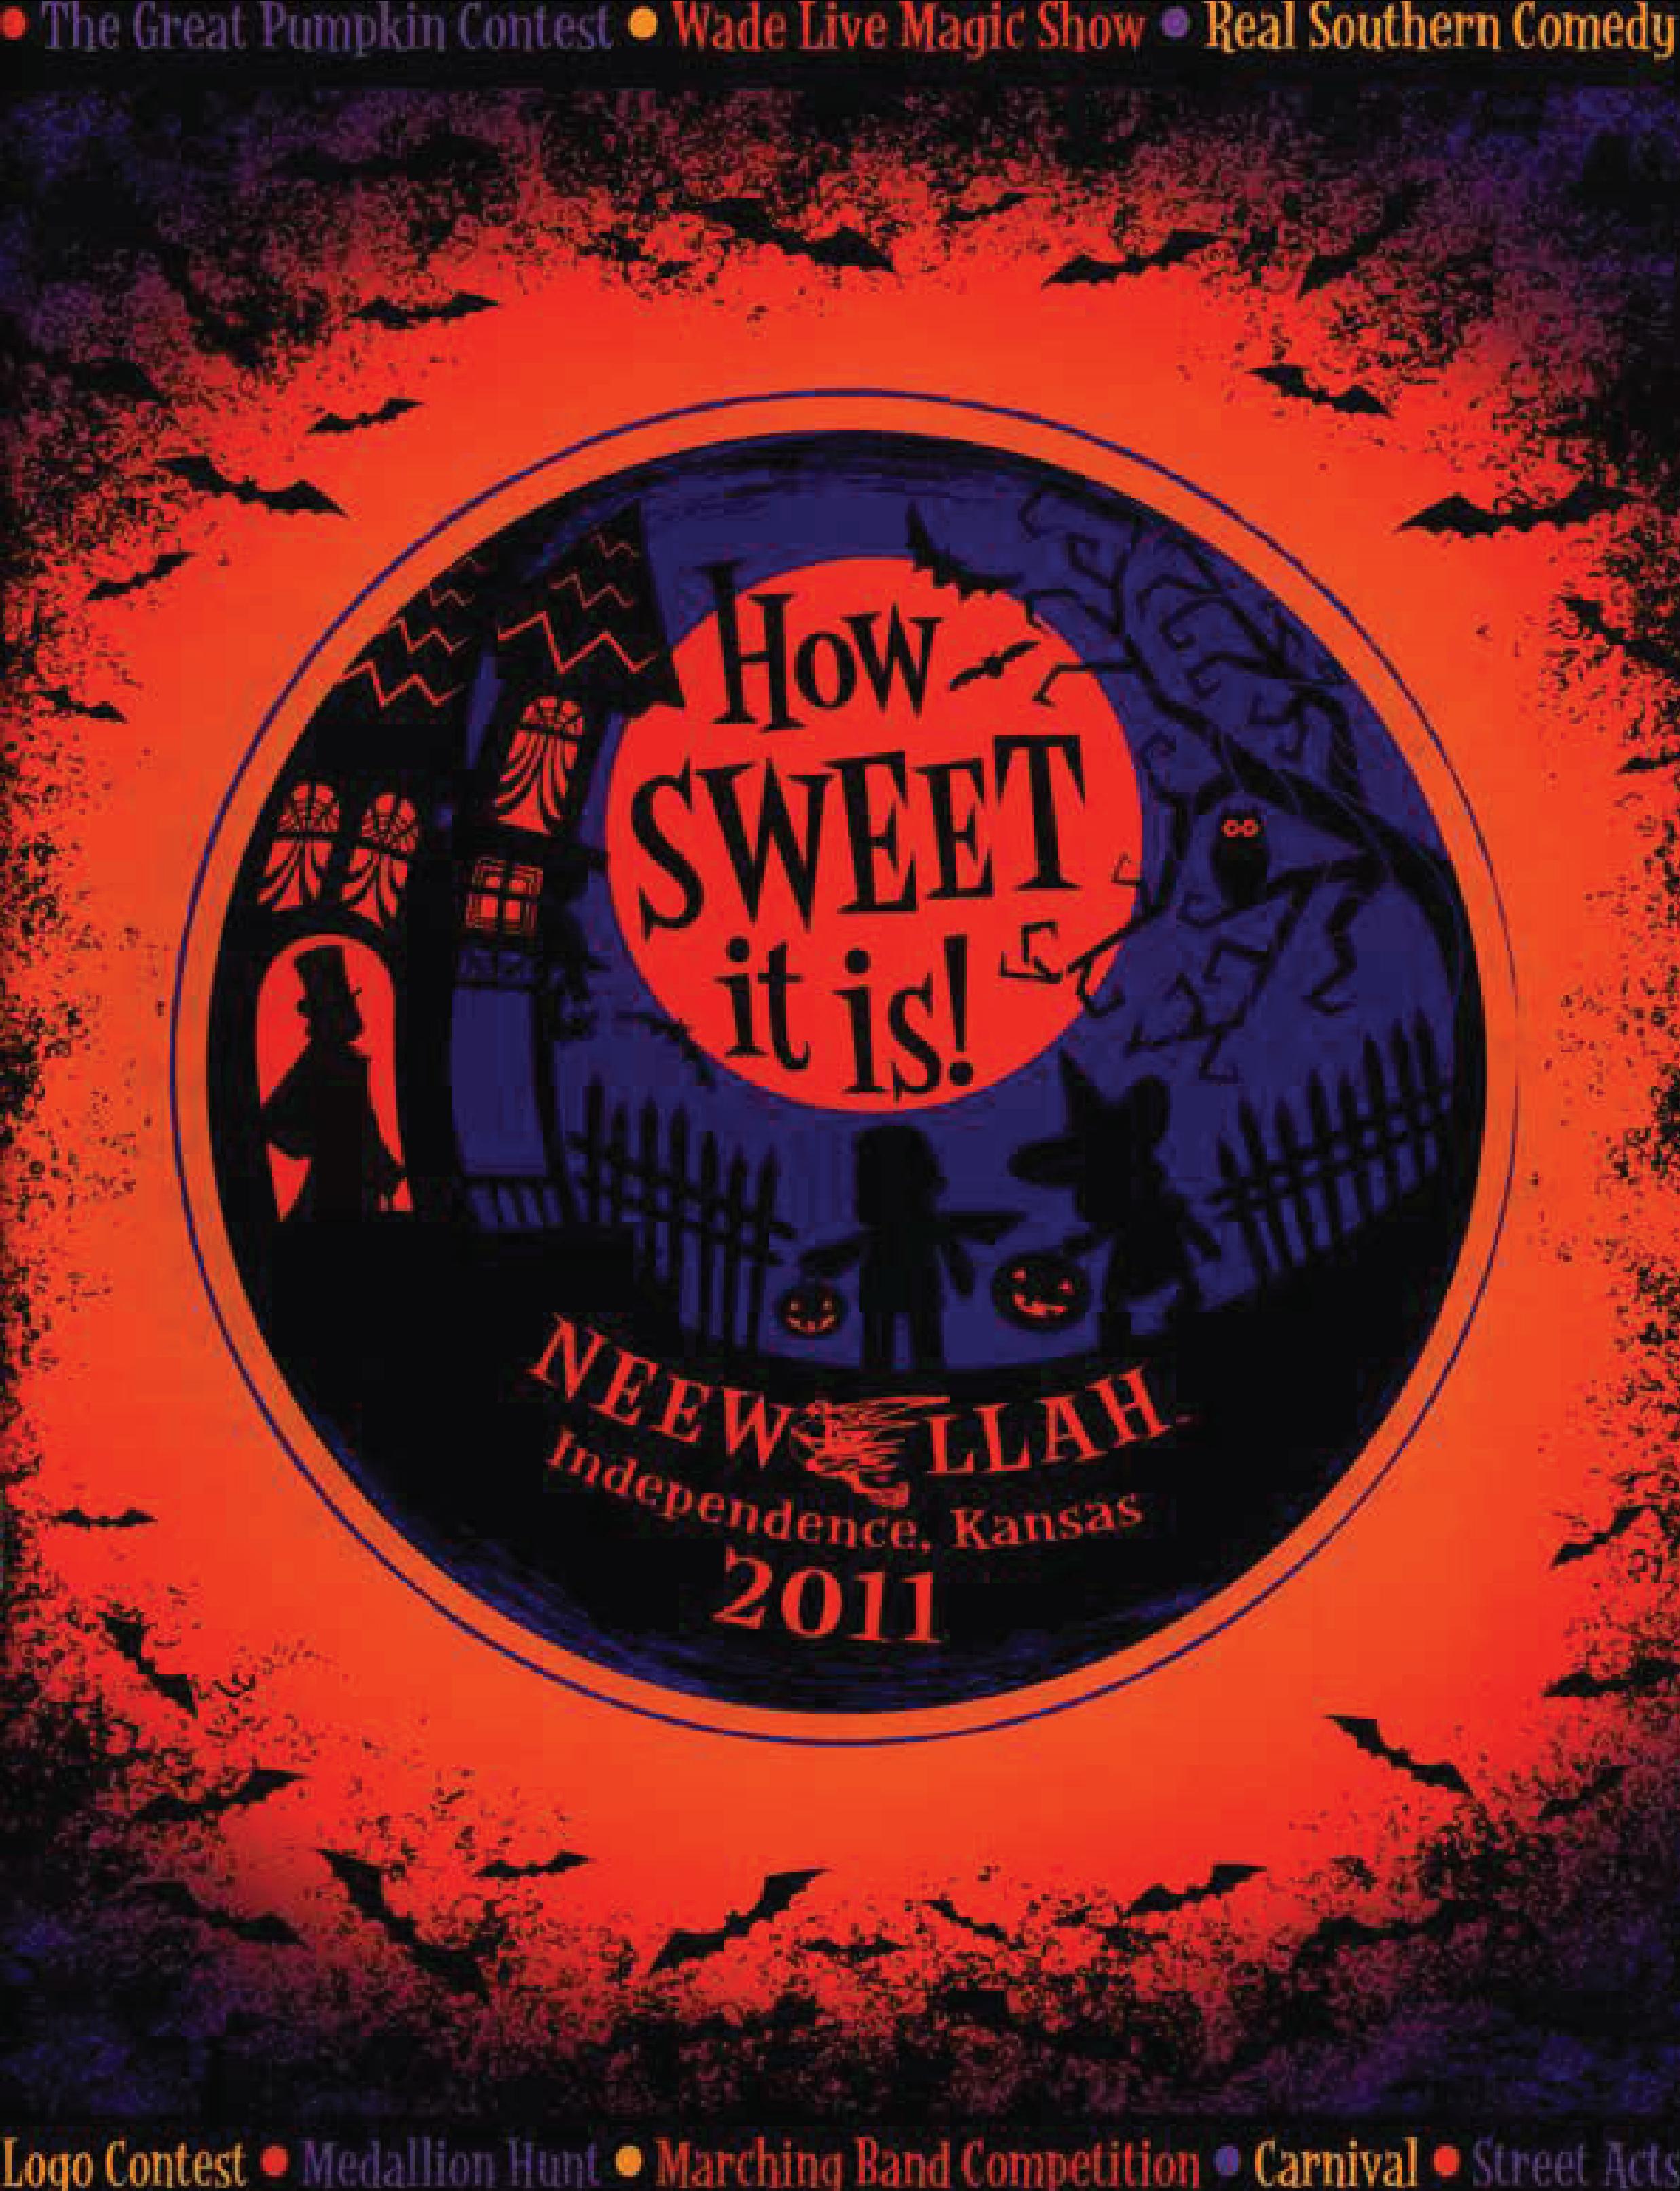 Neewollah 2011 How Sweet It Is